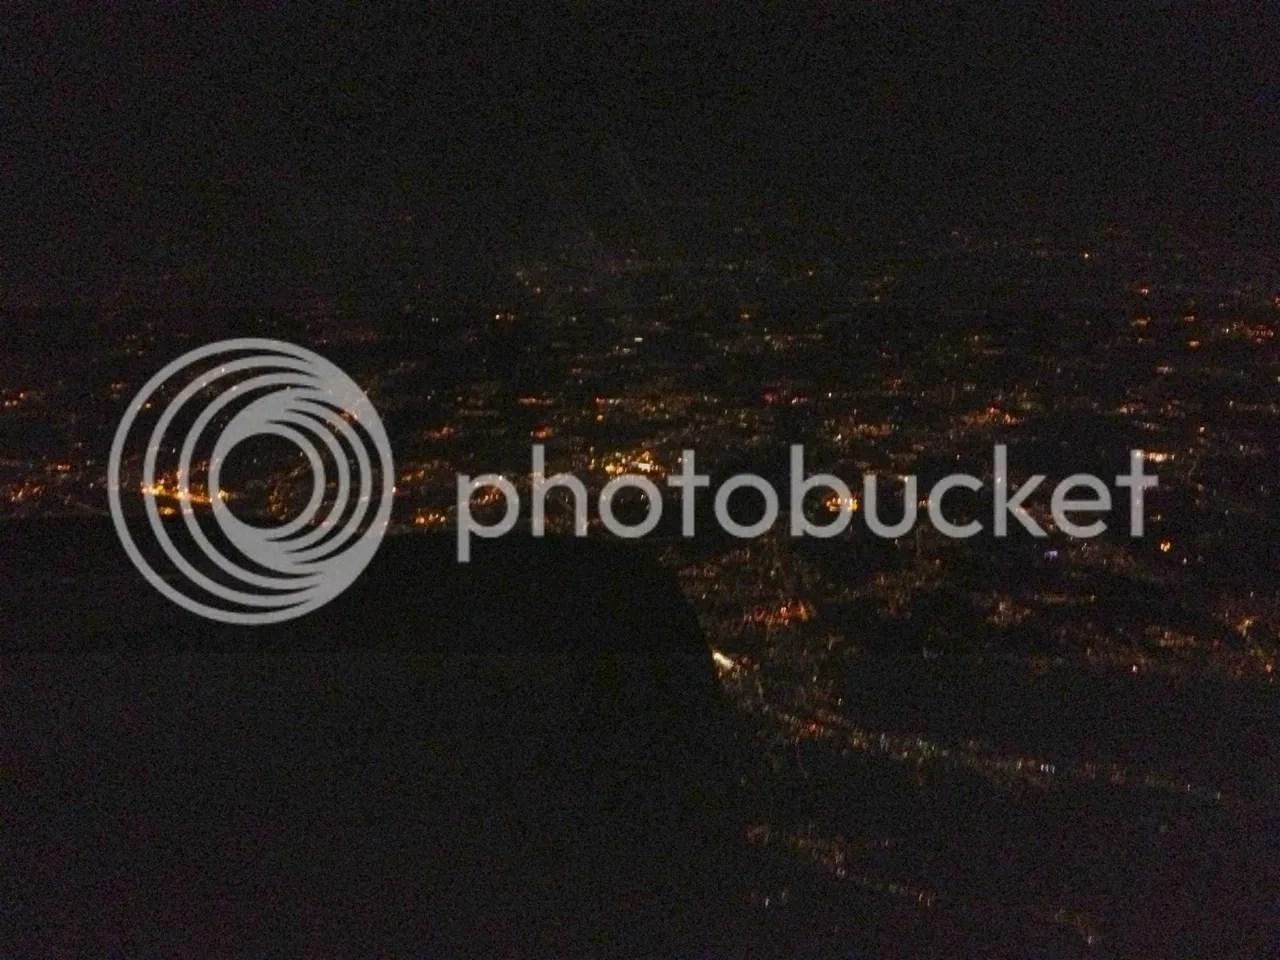 https://i0.wp.com/i181.photobucket.com/albums/x35/jwhite9185/Milan/file-126.jpg